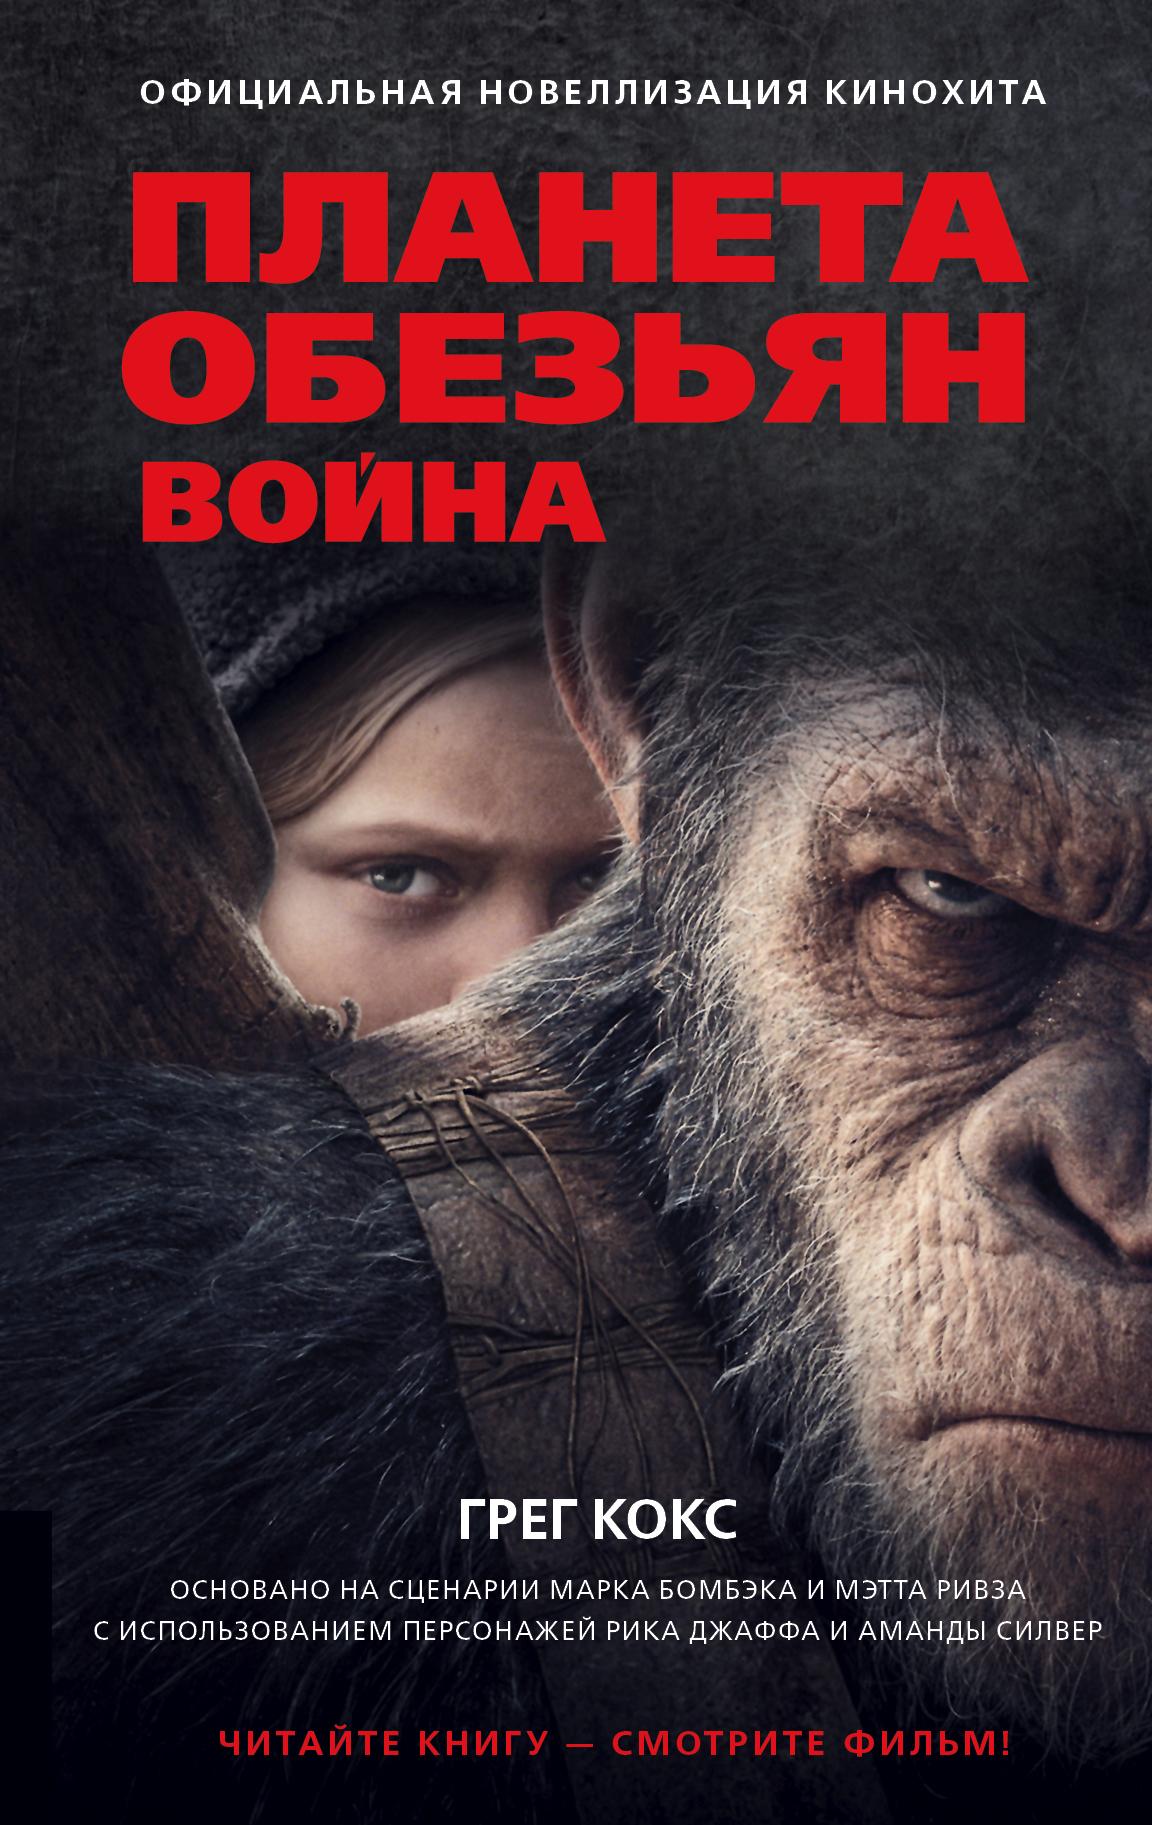 Кокс Г. Планета обезьян. Война миллан цезарь главная книга вожака стаи